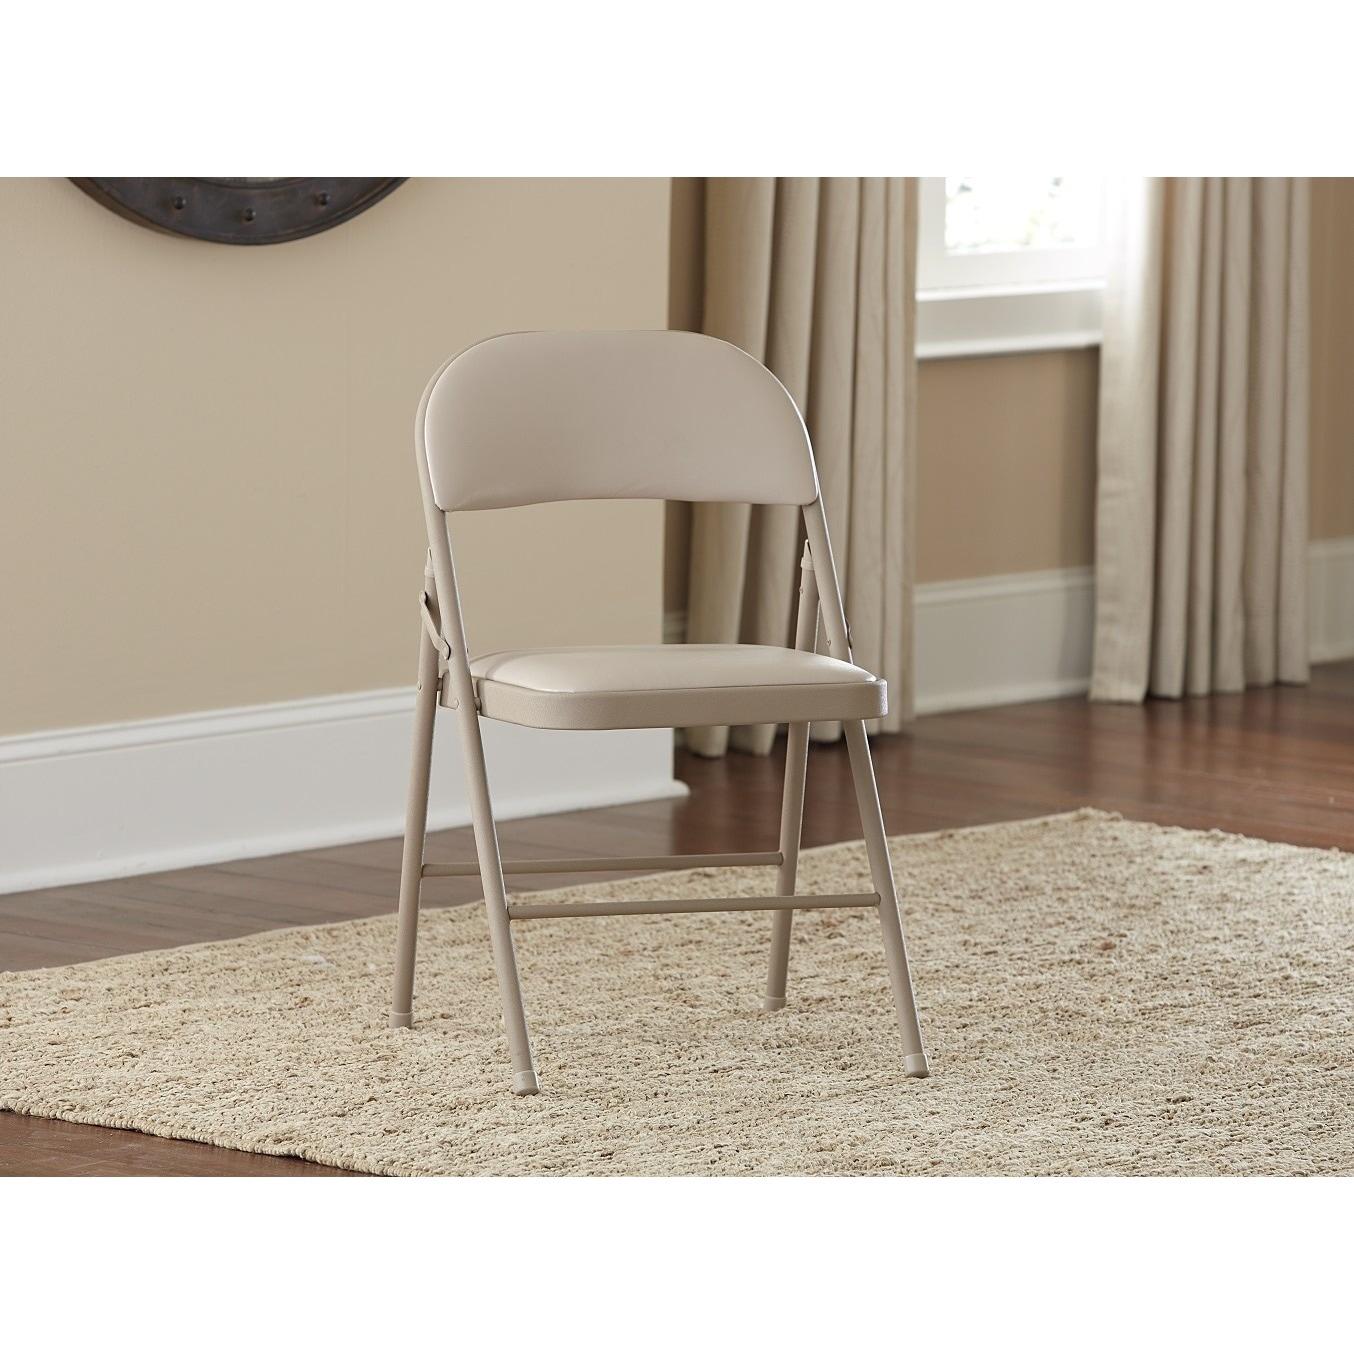 Cosco Vinyl Folding Chair 4 Pack (Antique Linen), Brown